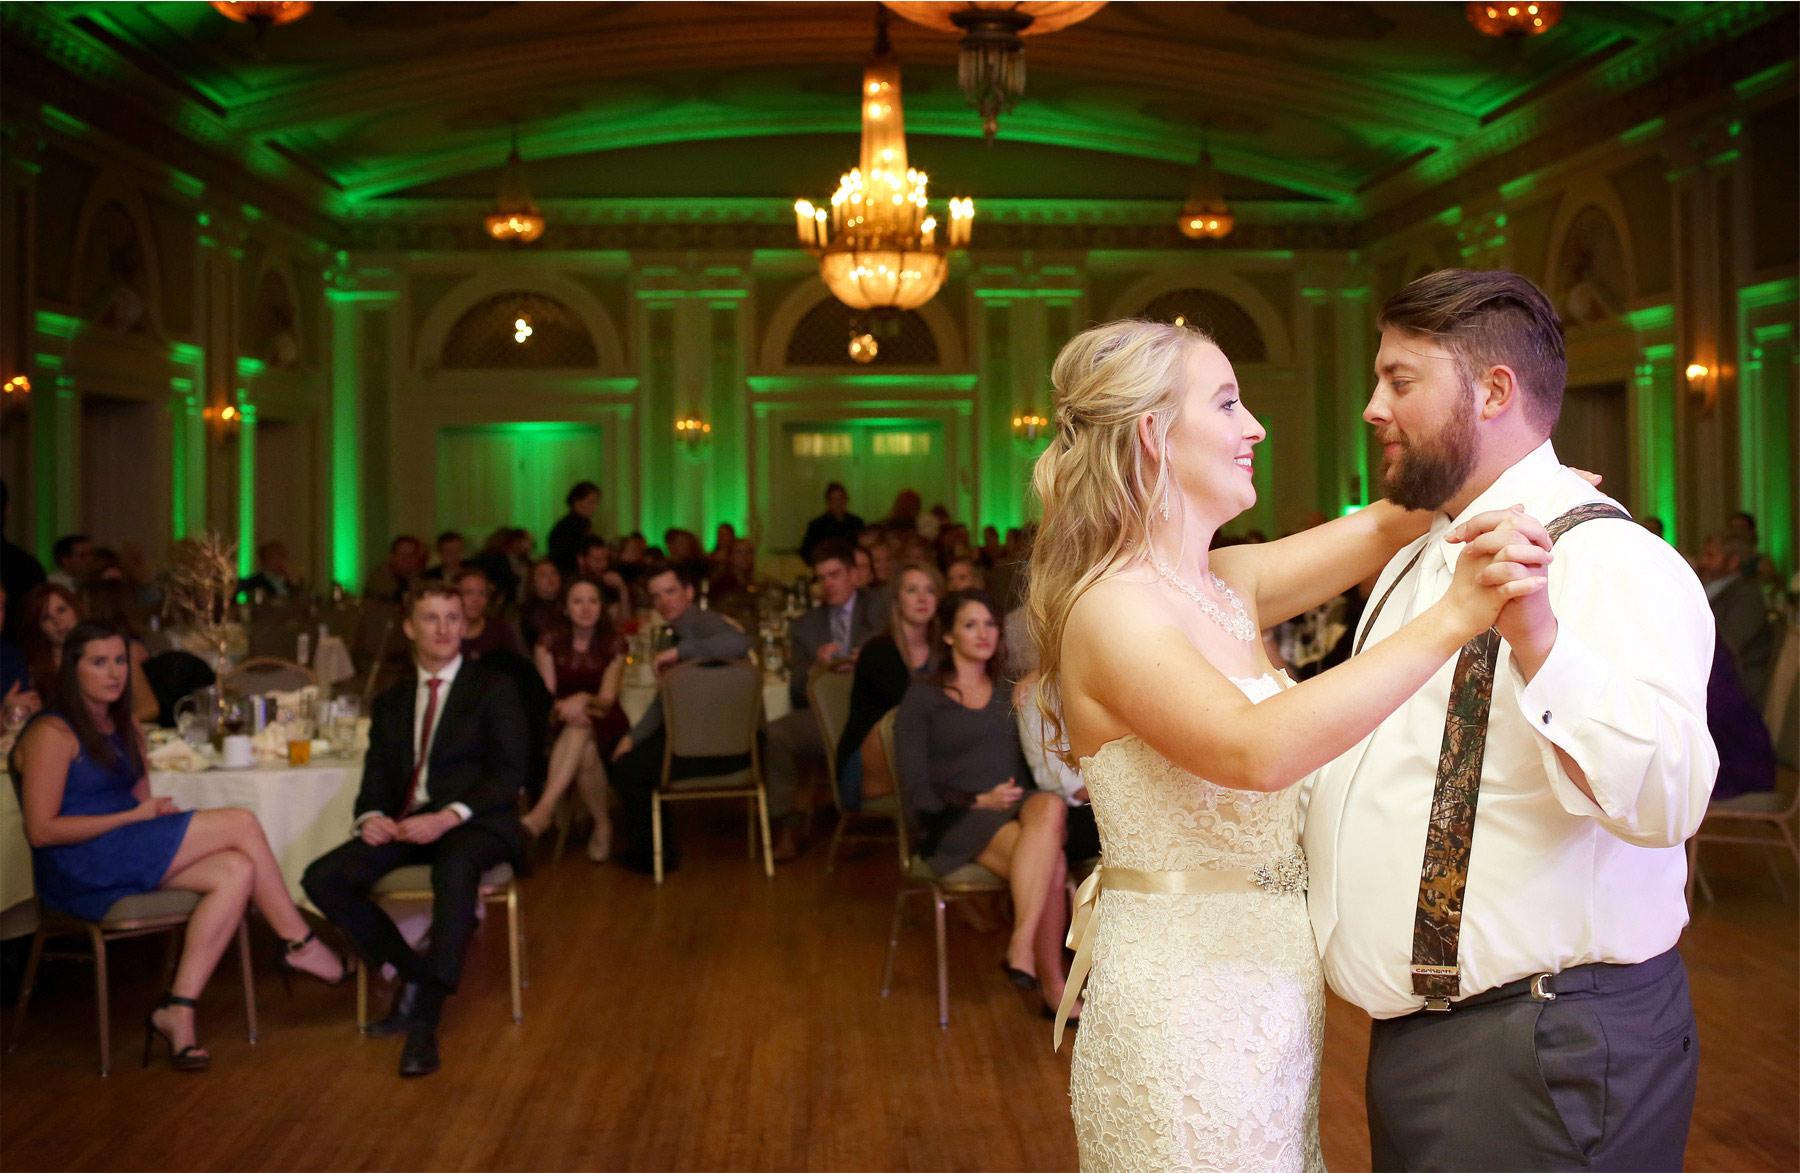 18-Duluth-Minnesota-Wedding-Photographer-by-Andrew-Vick-Photography-Fall-Autumn-Greysolon-Ballroom-Reception-Bride-Groom-Dance-Molly-and-Carson.jpg